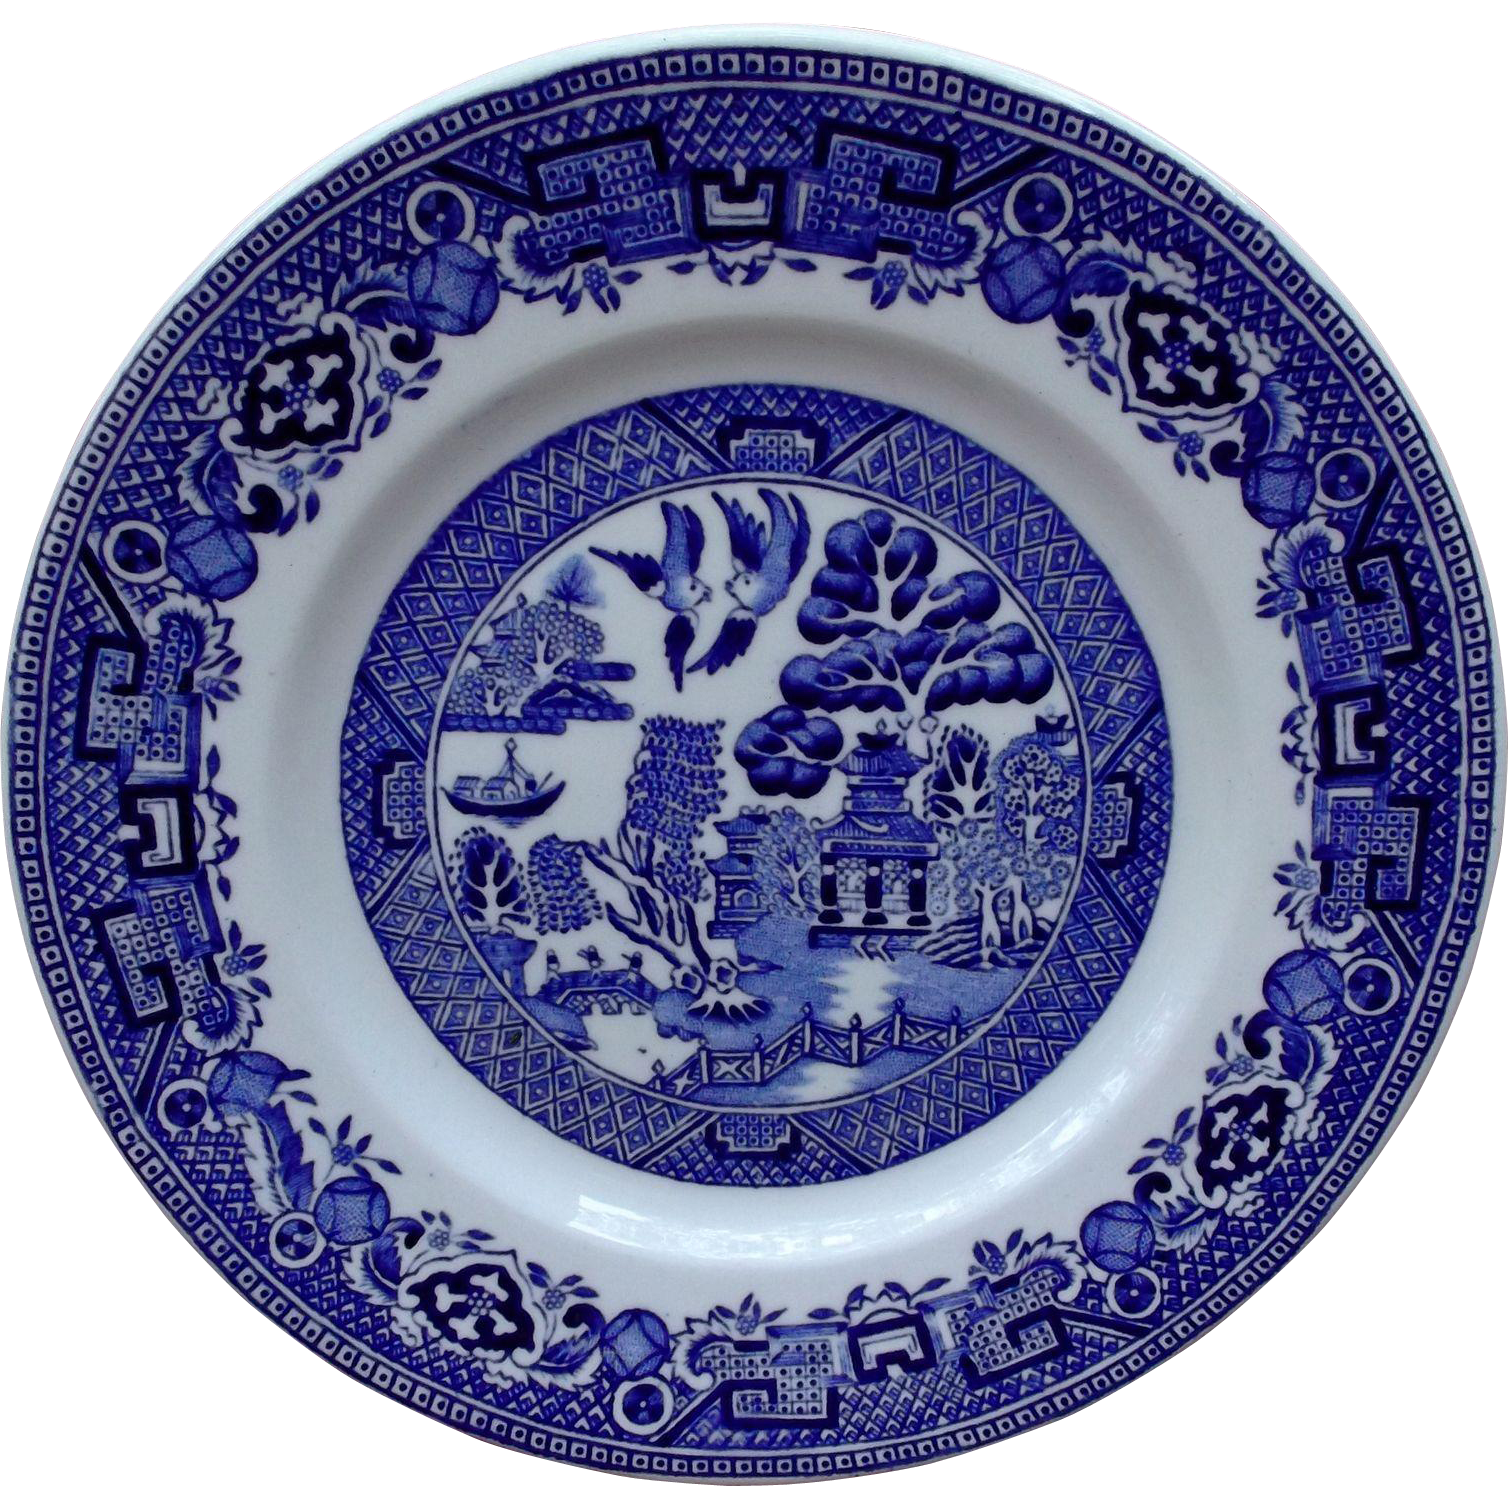 Ridgway Blue Willow Bread Desert Plates 1940's